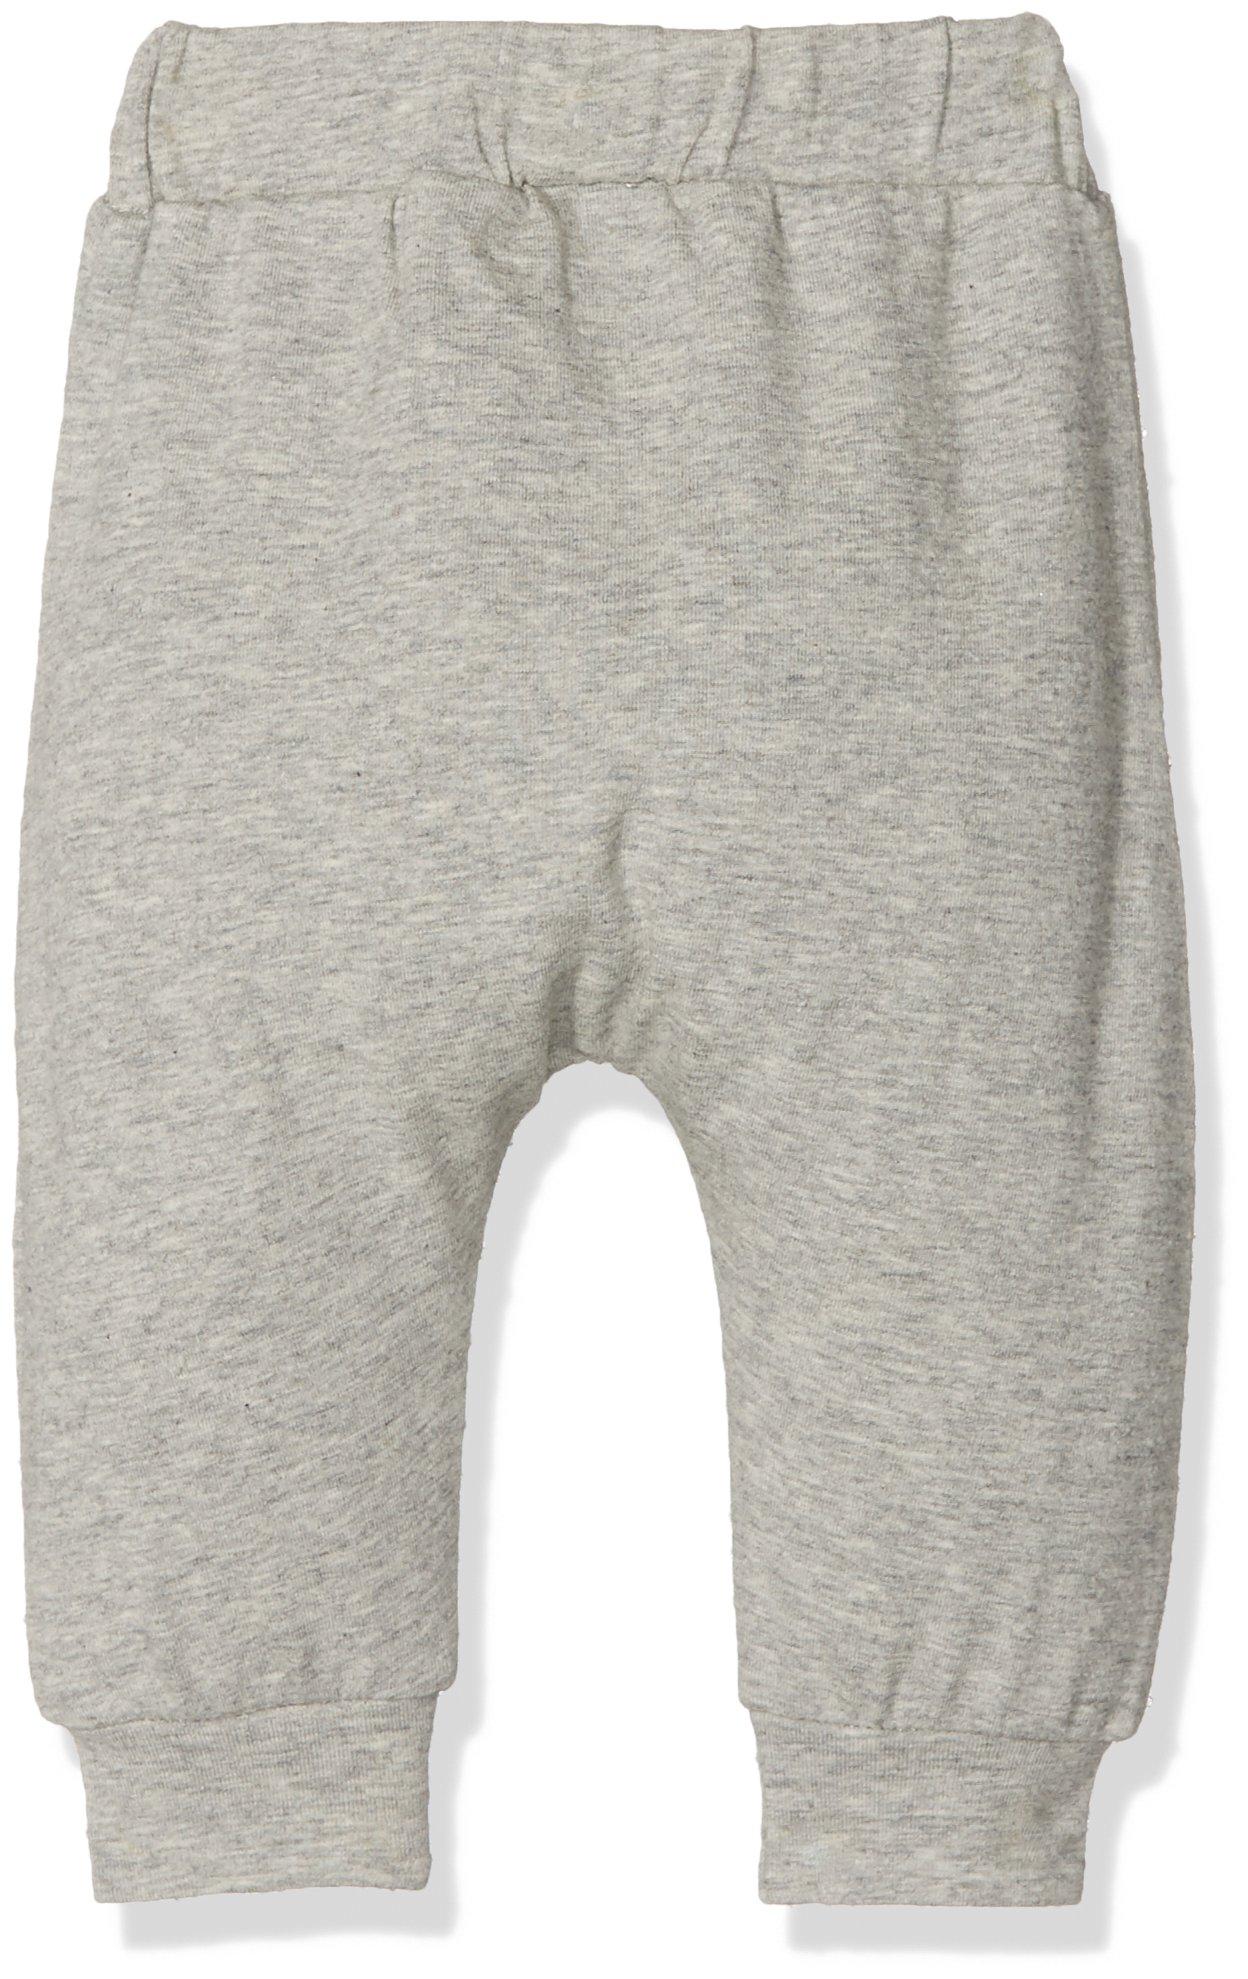 NAME IT Nbnumoga Pant Pantalones para Bebés 2